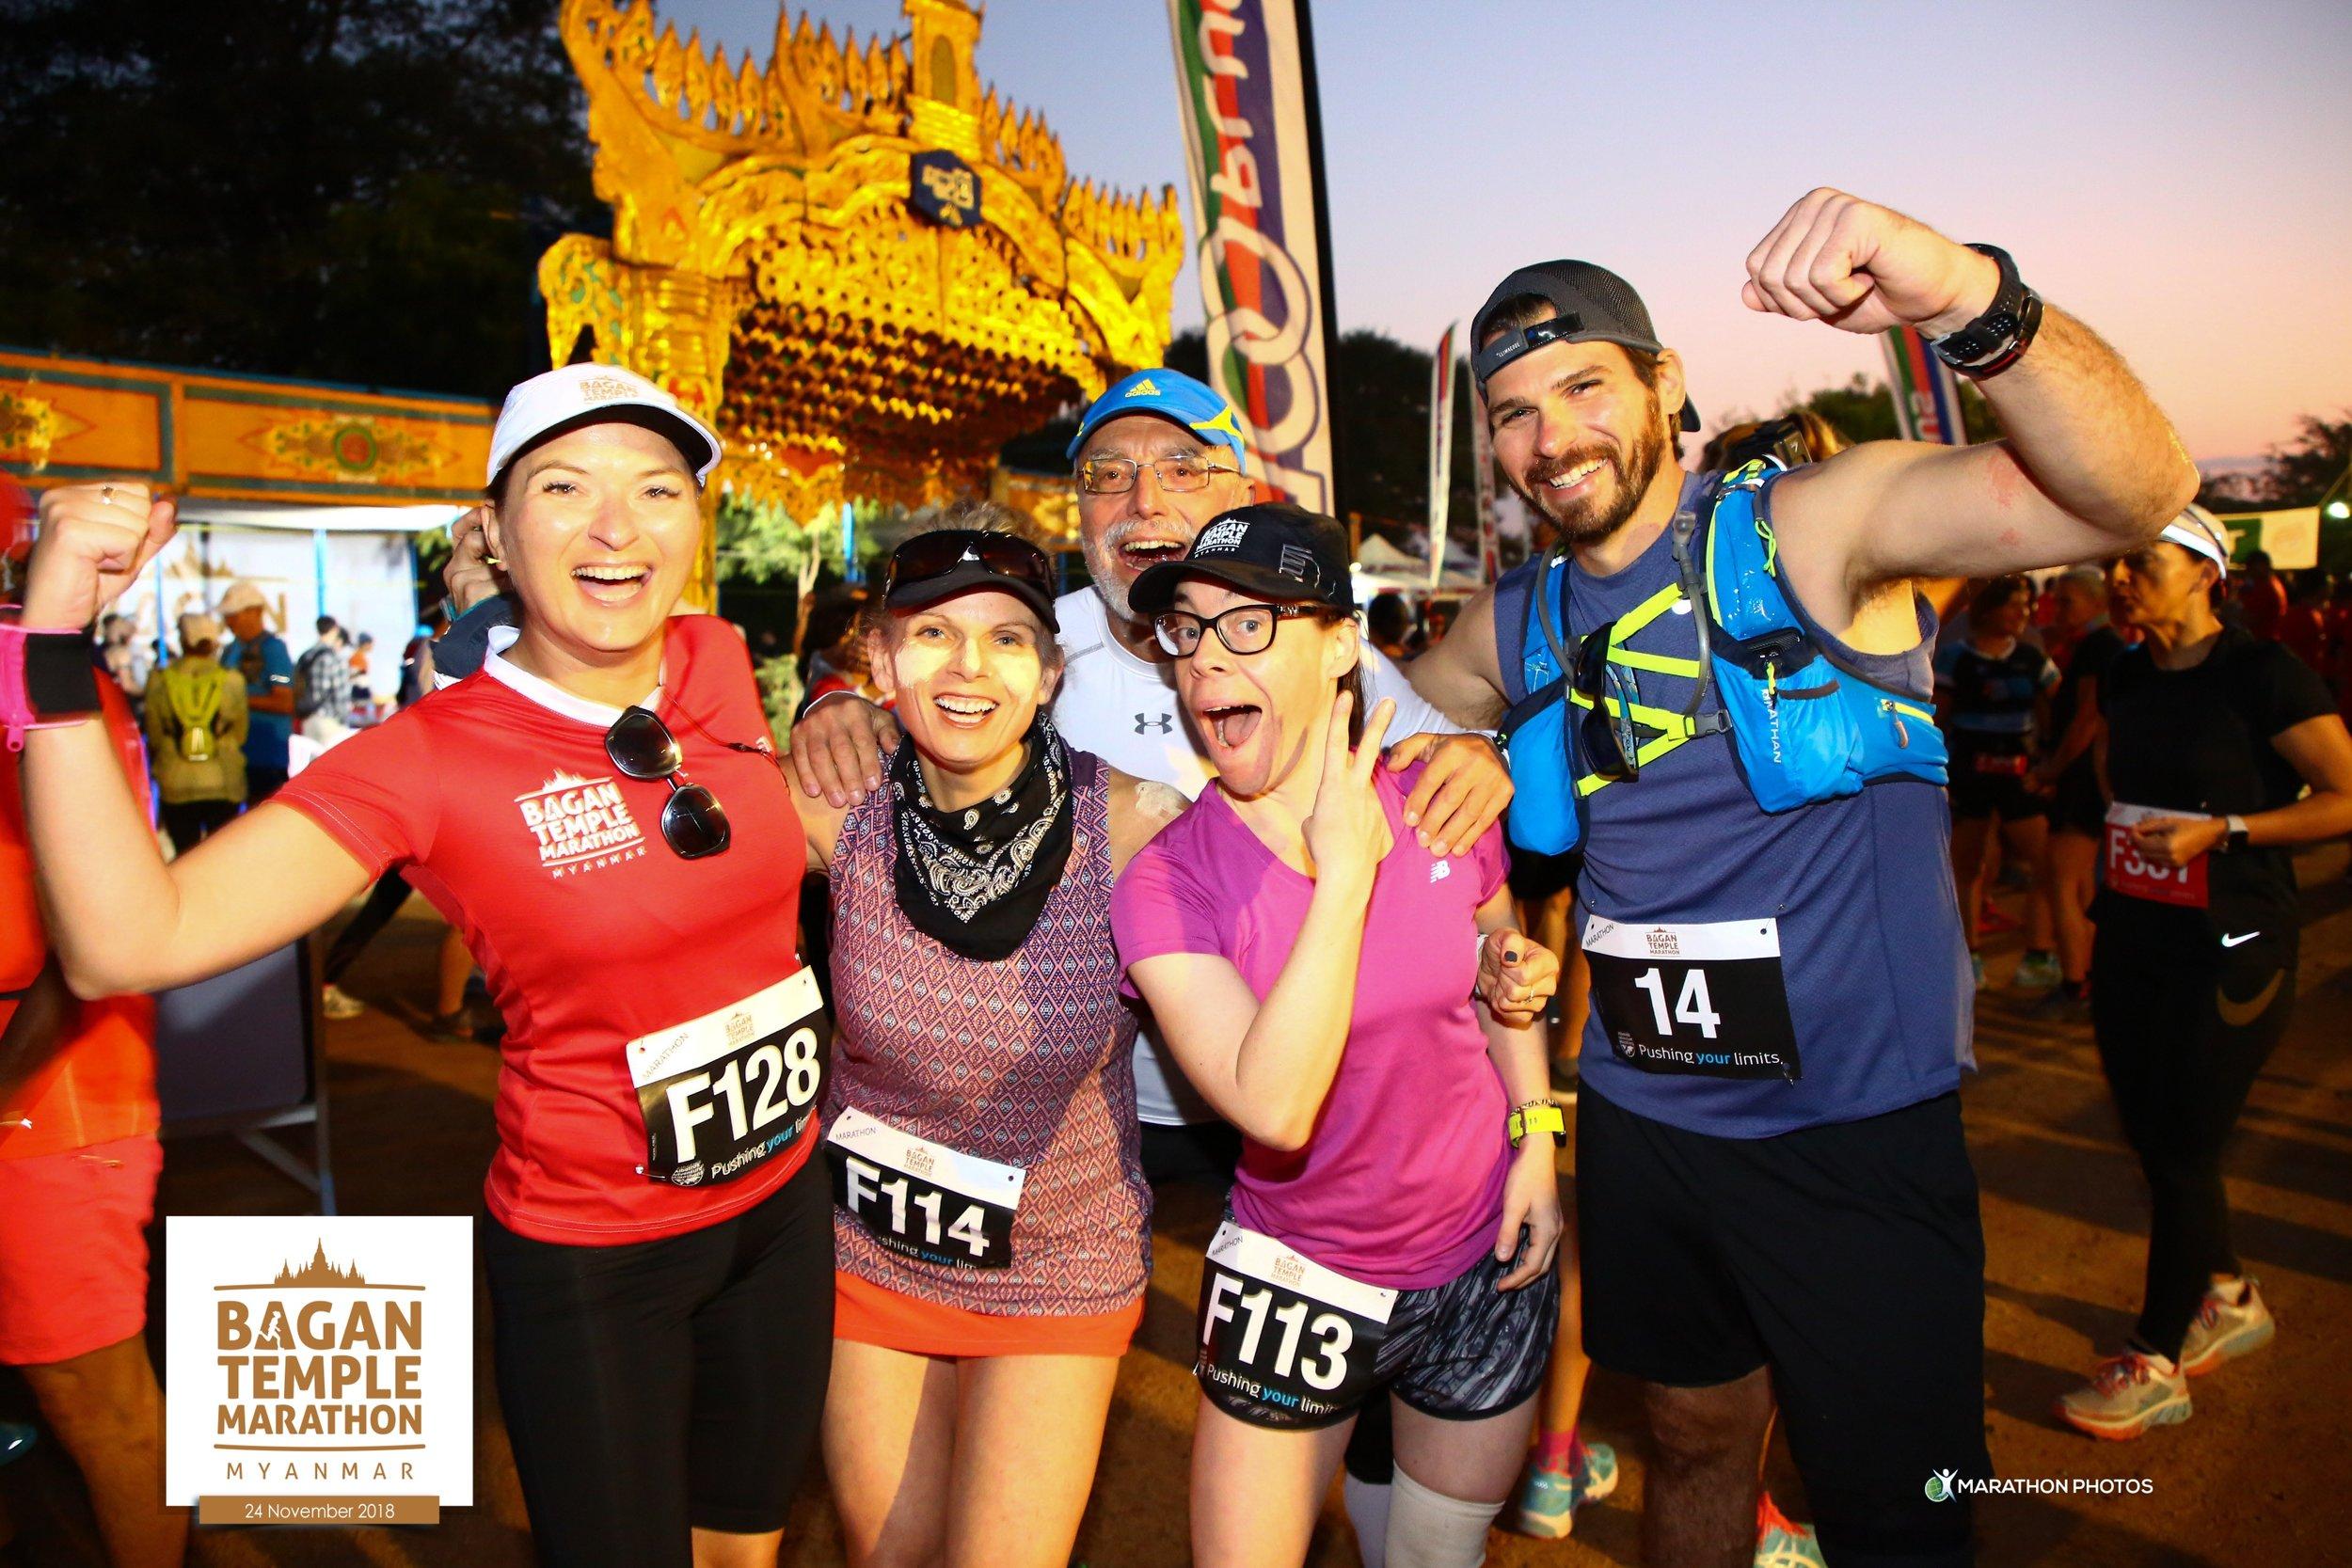 Bagan Temple Marathon 2018 - Myanmar